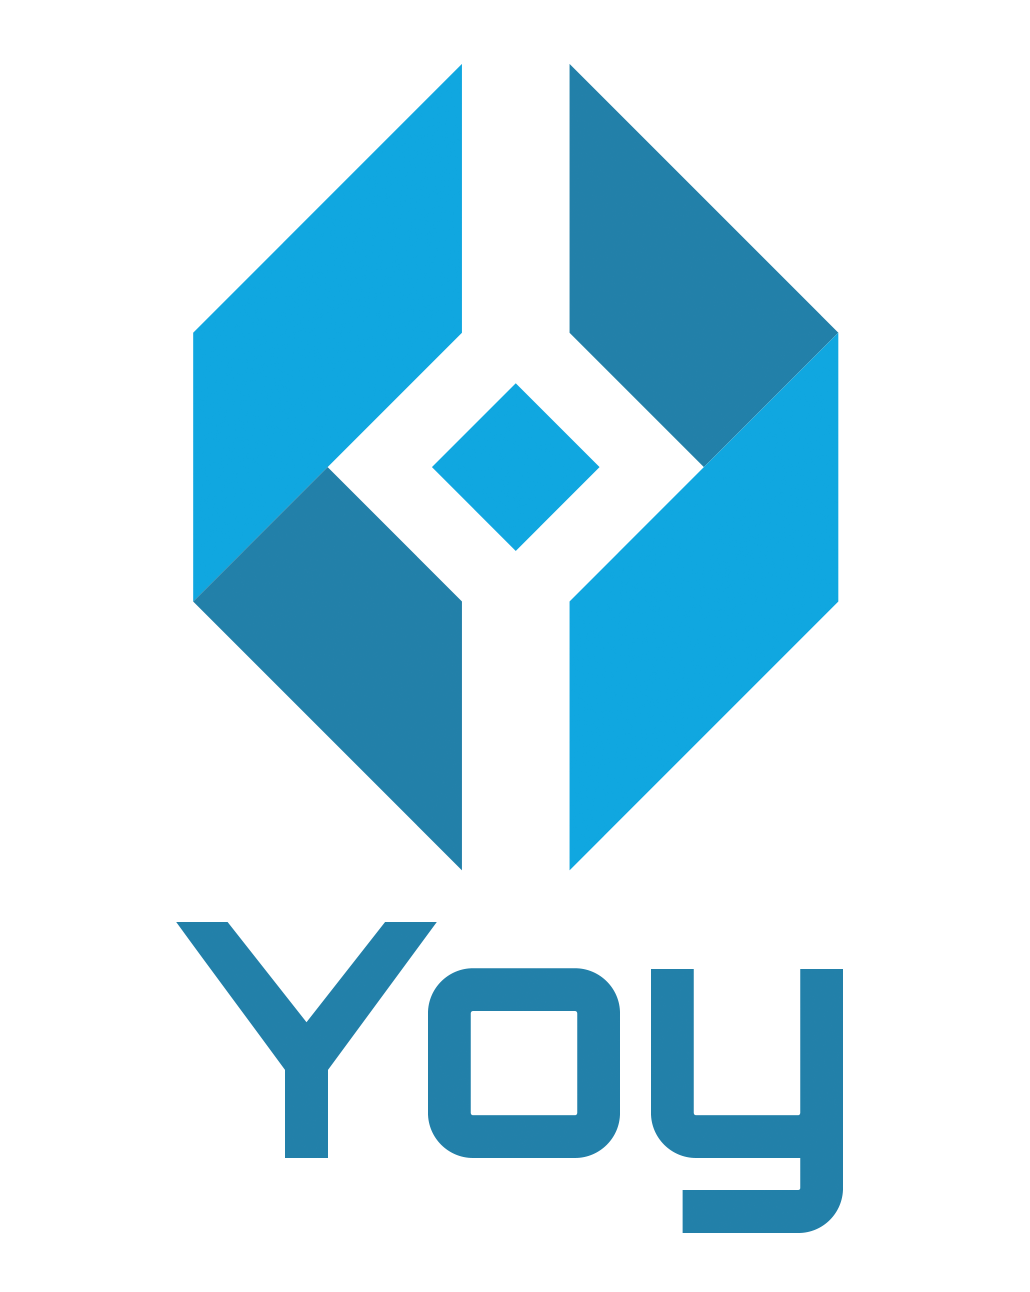 Empresas Desafio10x: Yoy Simulators